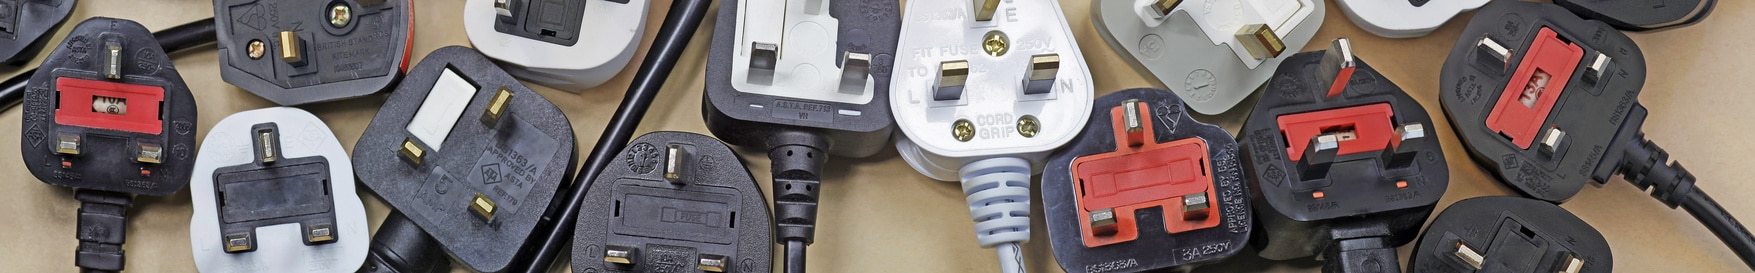 UK electrical applicance plugs